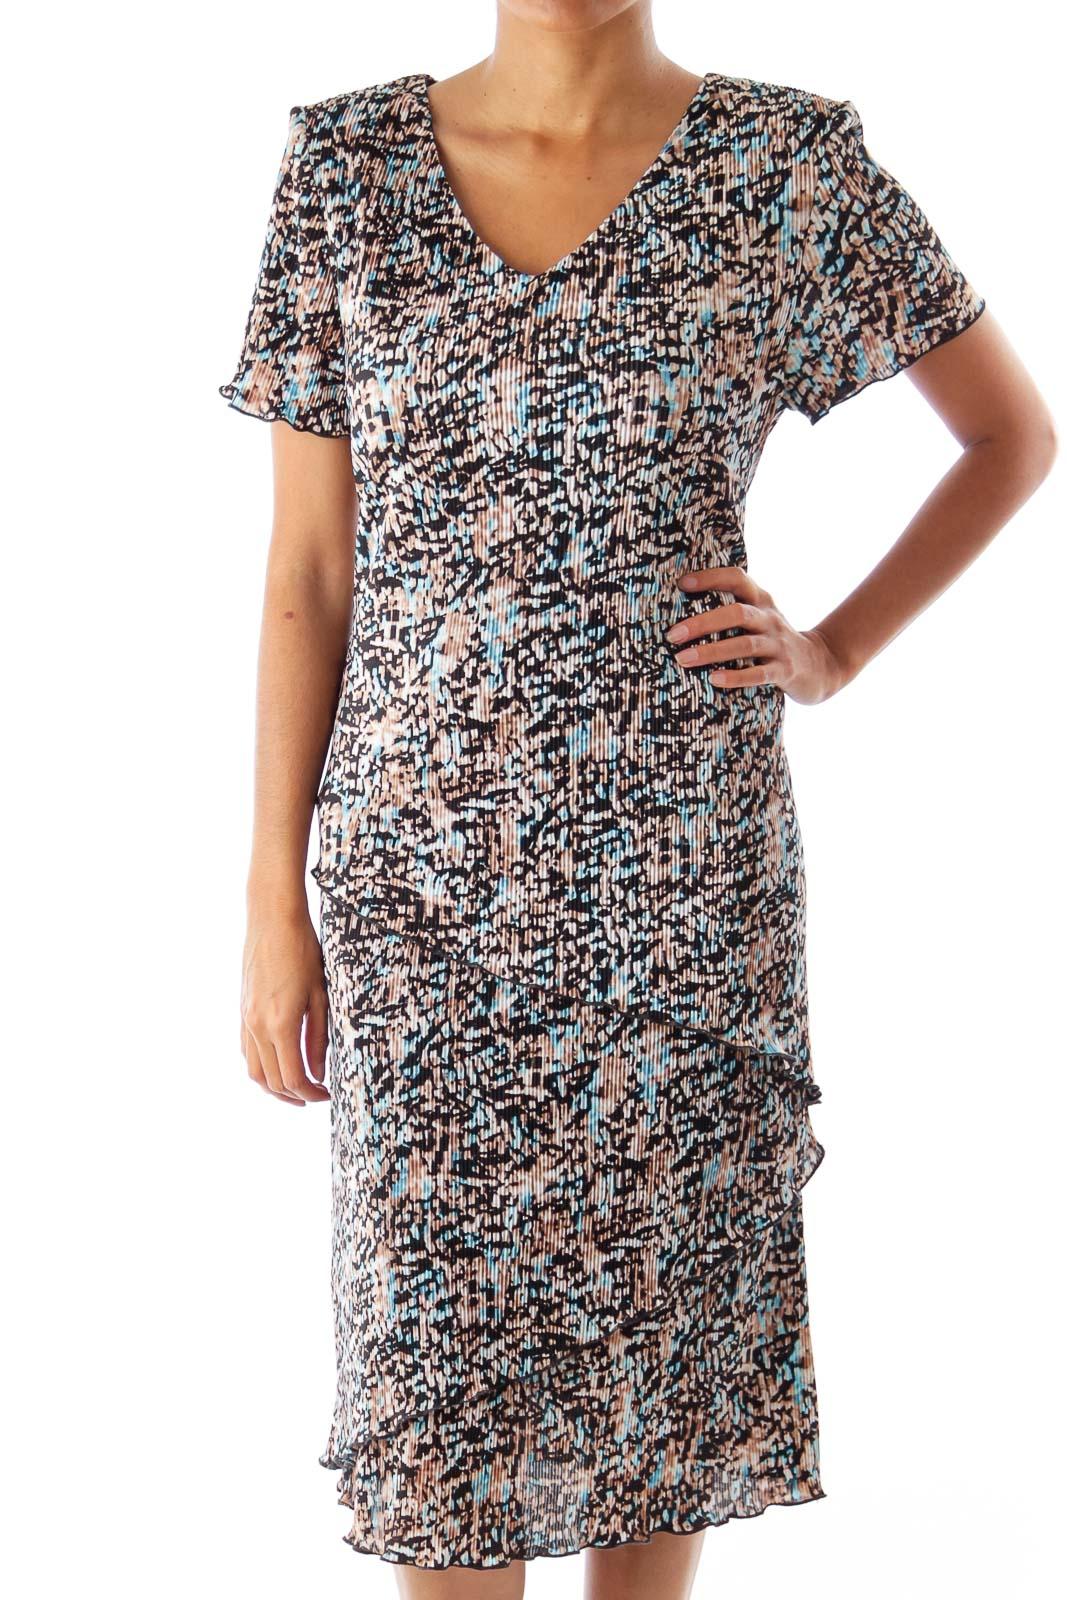 Black & Blue & Beige Layered Dress Front